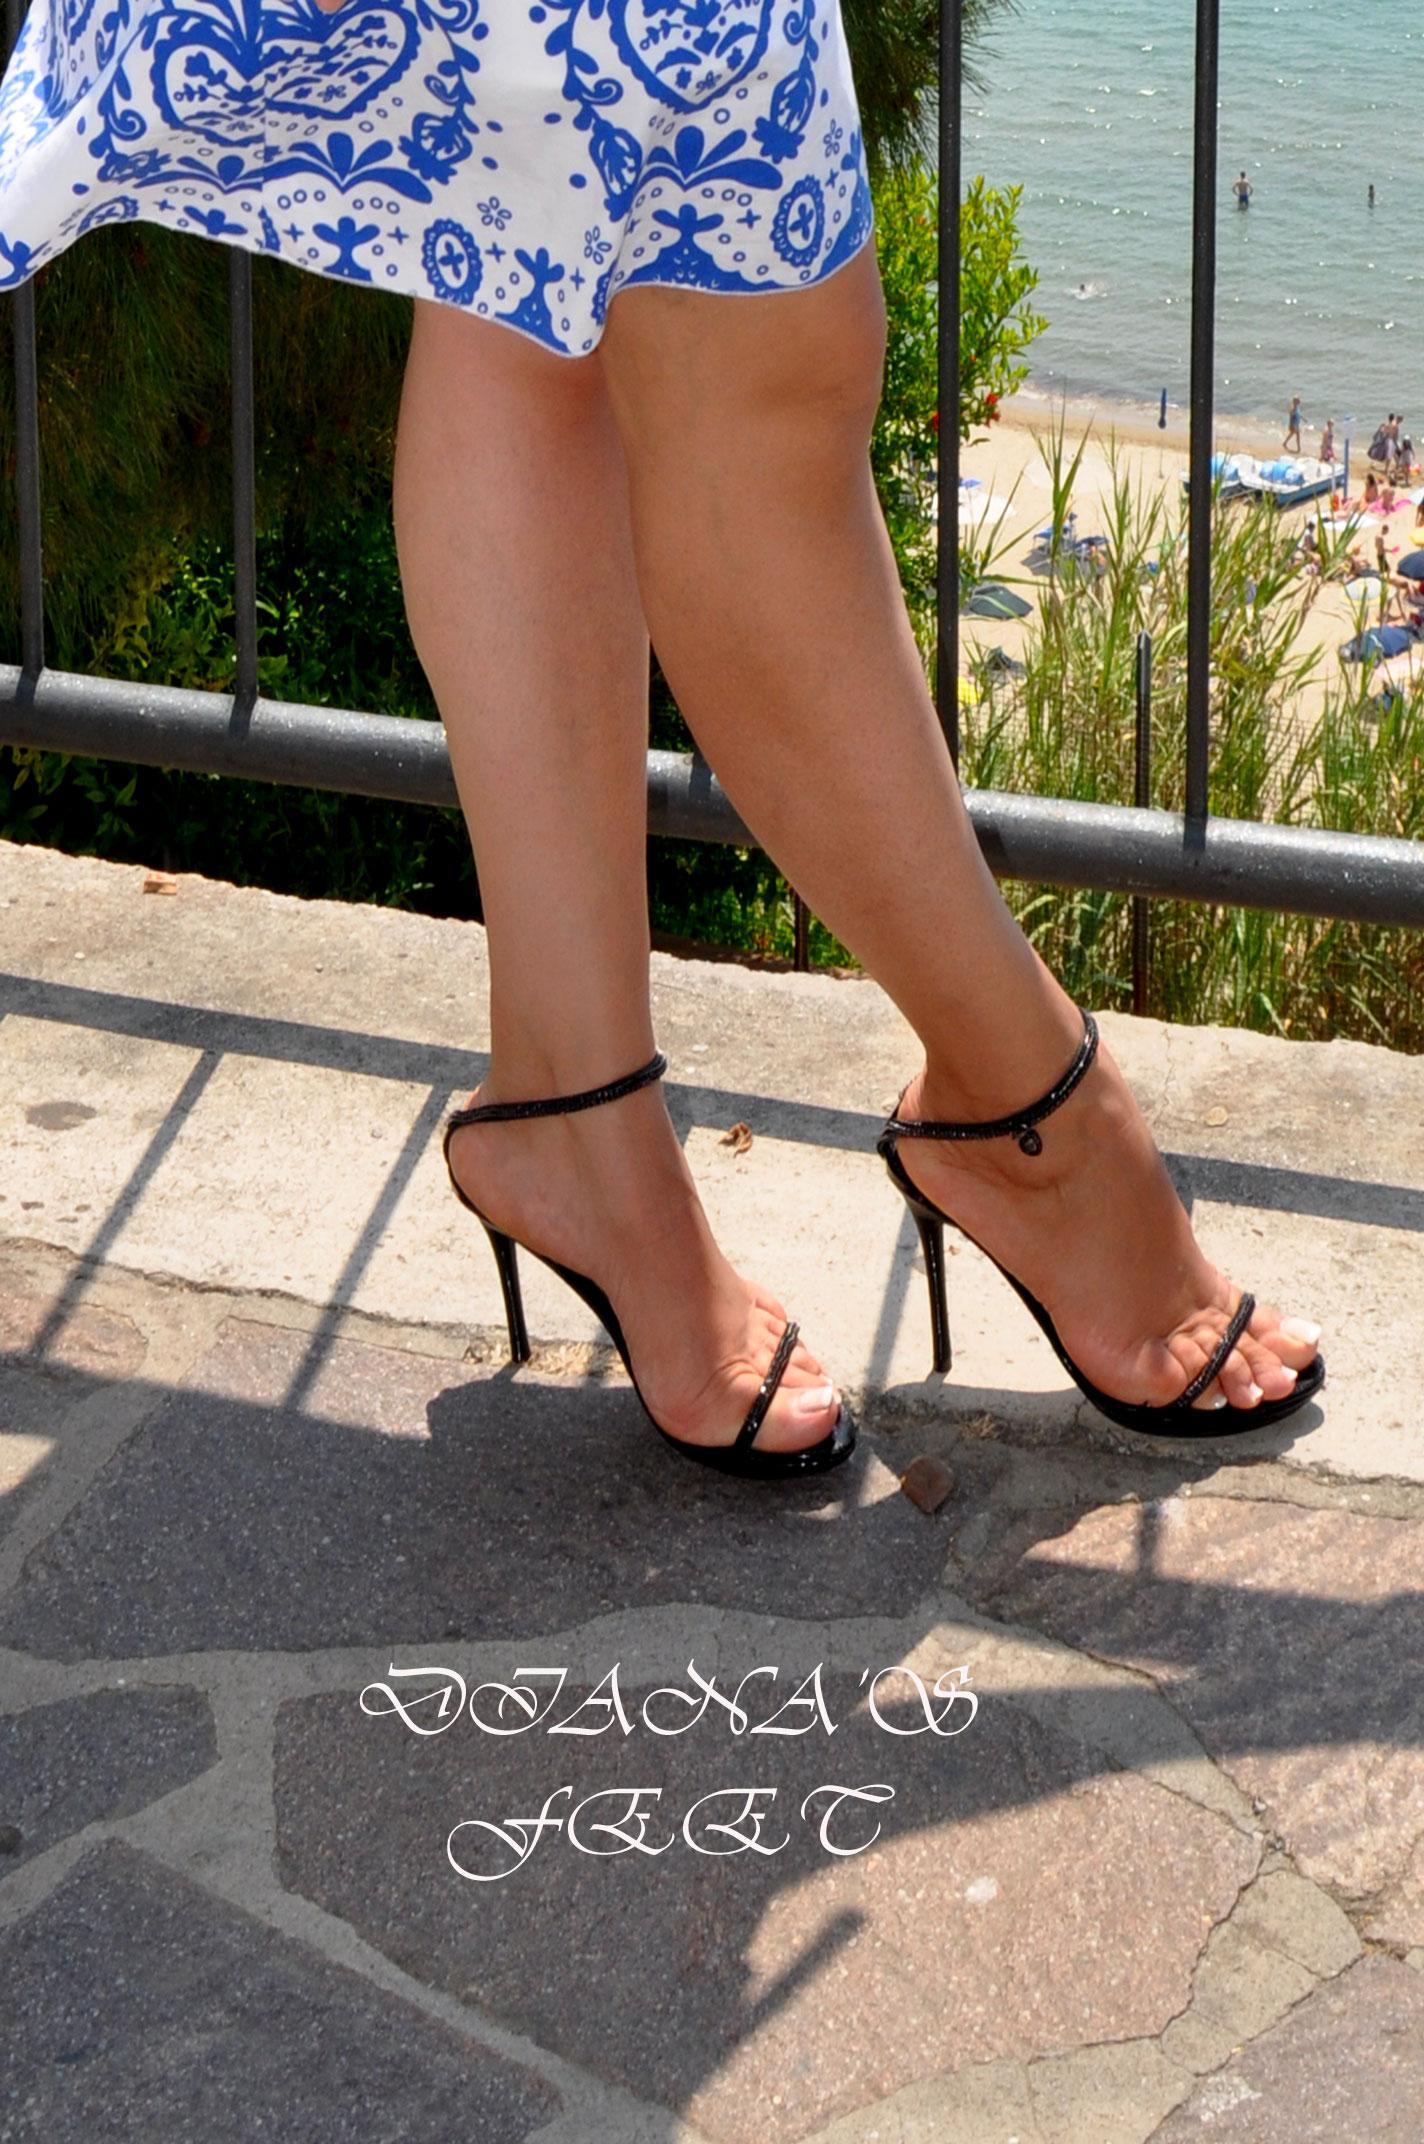 Diana 's feet 8bf21510